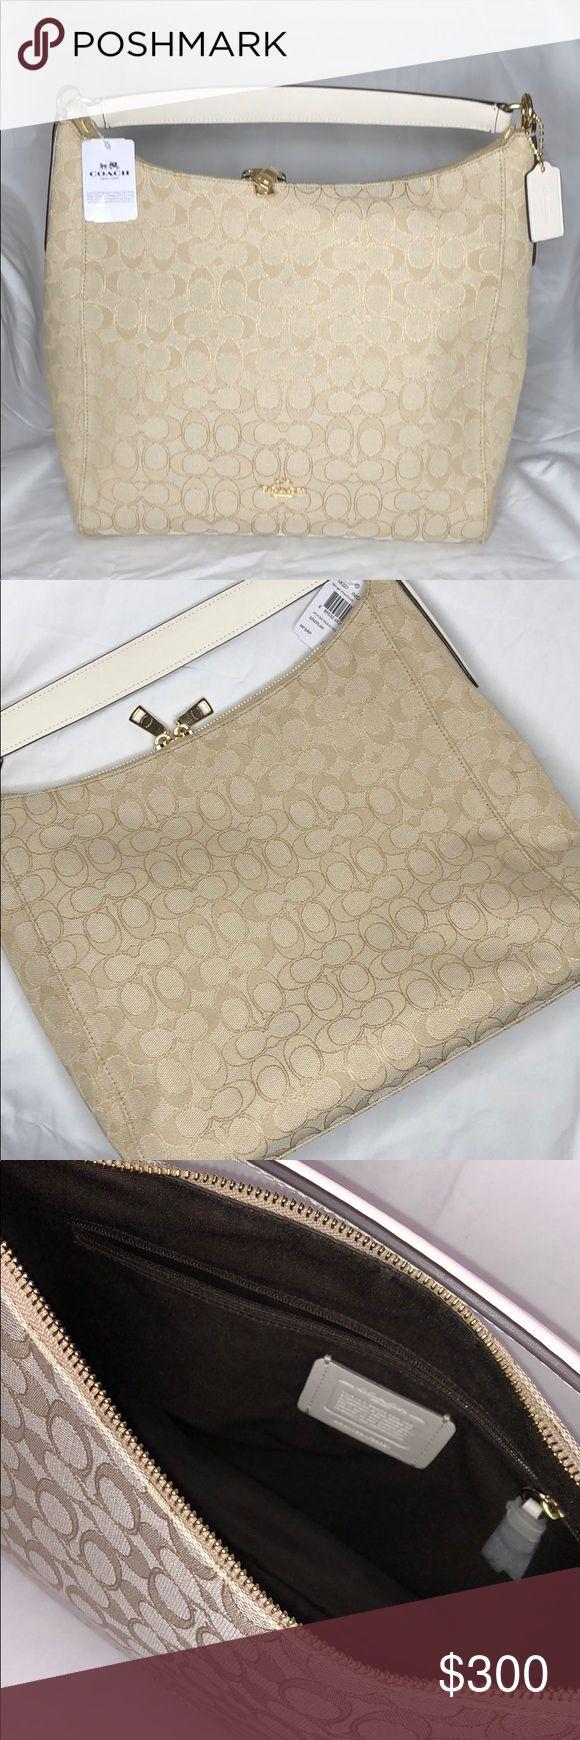 "NWT $375 COACH HOBO - LIGHT KHAKI NWT $375 COACH HOBO - LIGHT KHAKI   ✨A Gorgeous Coach Canvas Hobo Bag ✨New with Tag - Original Coach Box ✨Approximate Measurements  Length 12.5"" Height 13"" Width 5"" ✨GHW ✨White Leather Handle and Trim  ✨Interior large zipper pocket - slip pockets   ✖️no trade✖️ Coach Bags Hobos"